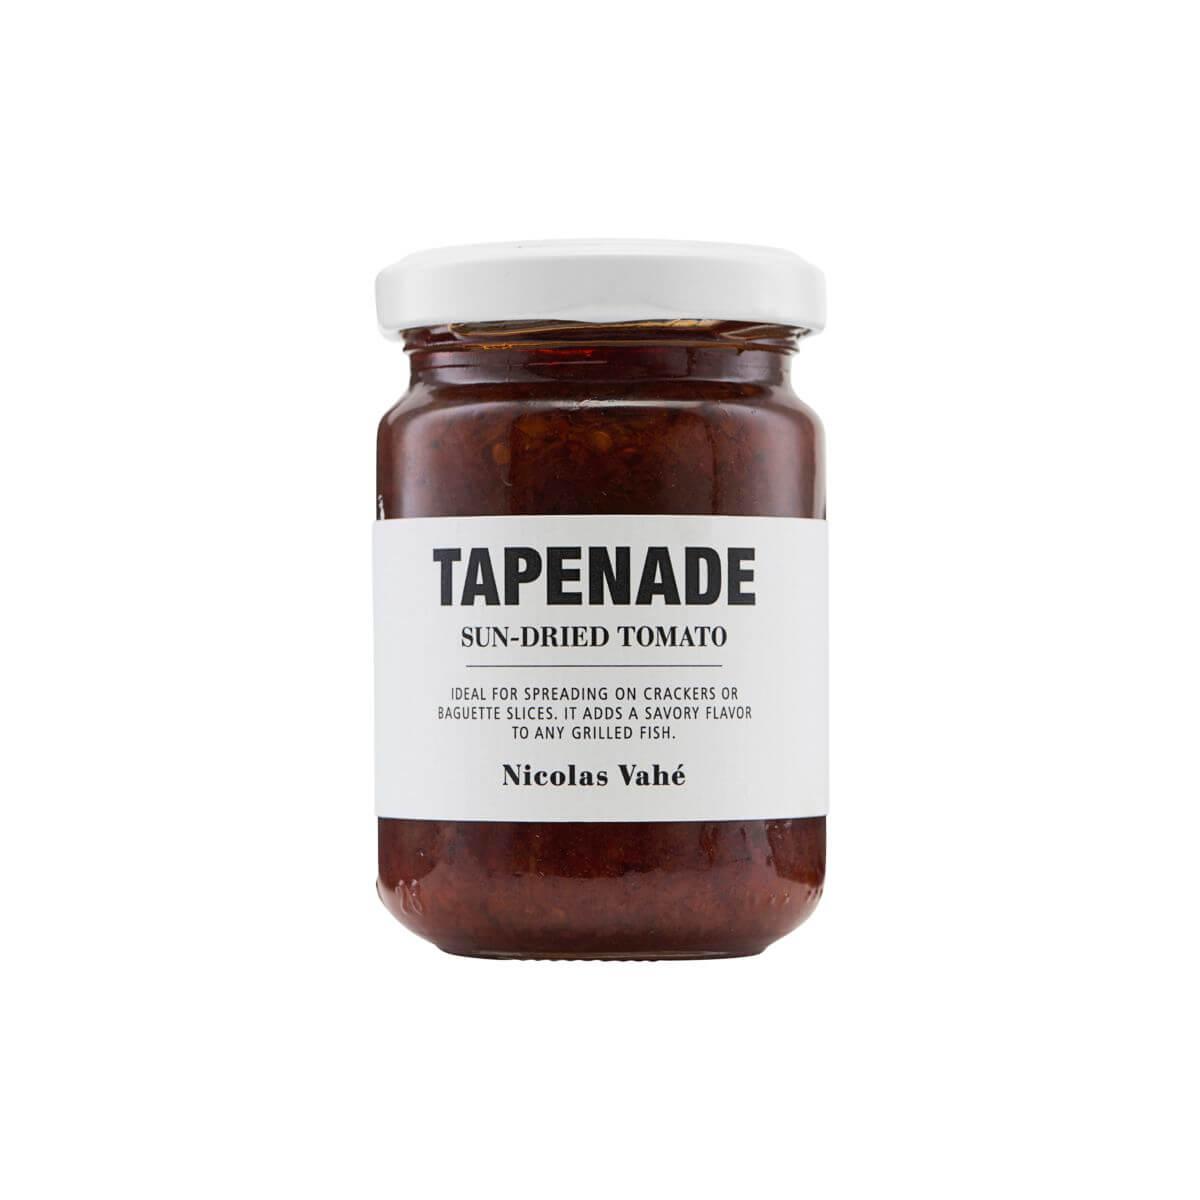 Tapenade - sólþurrkaðir tómatar